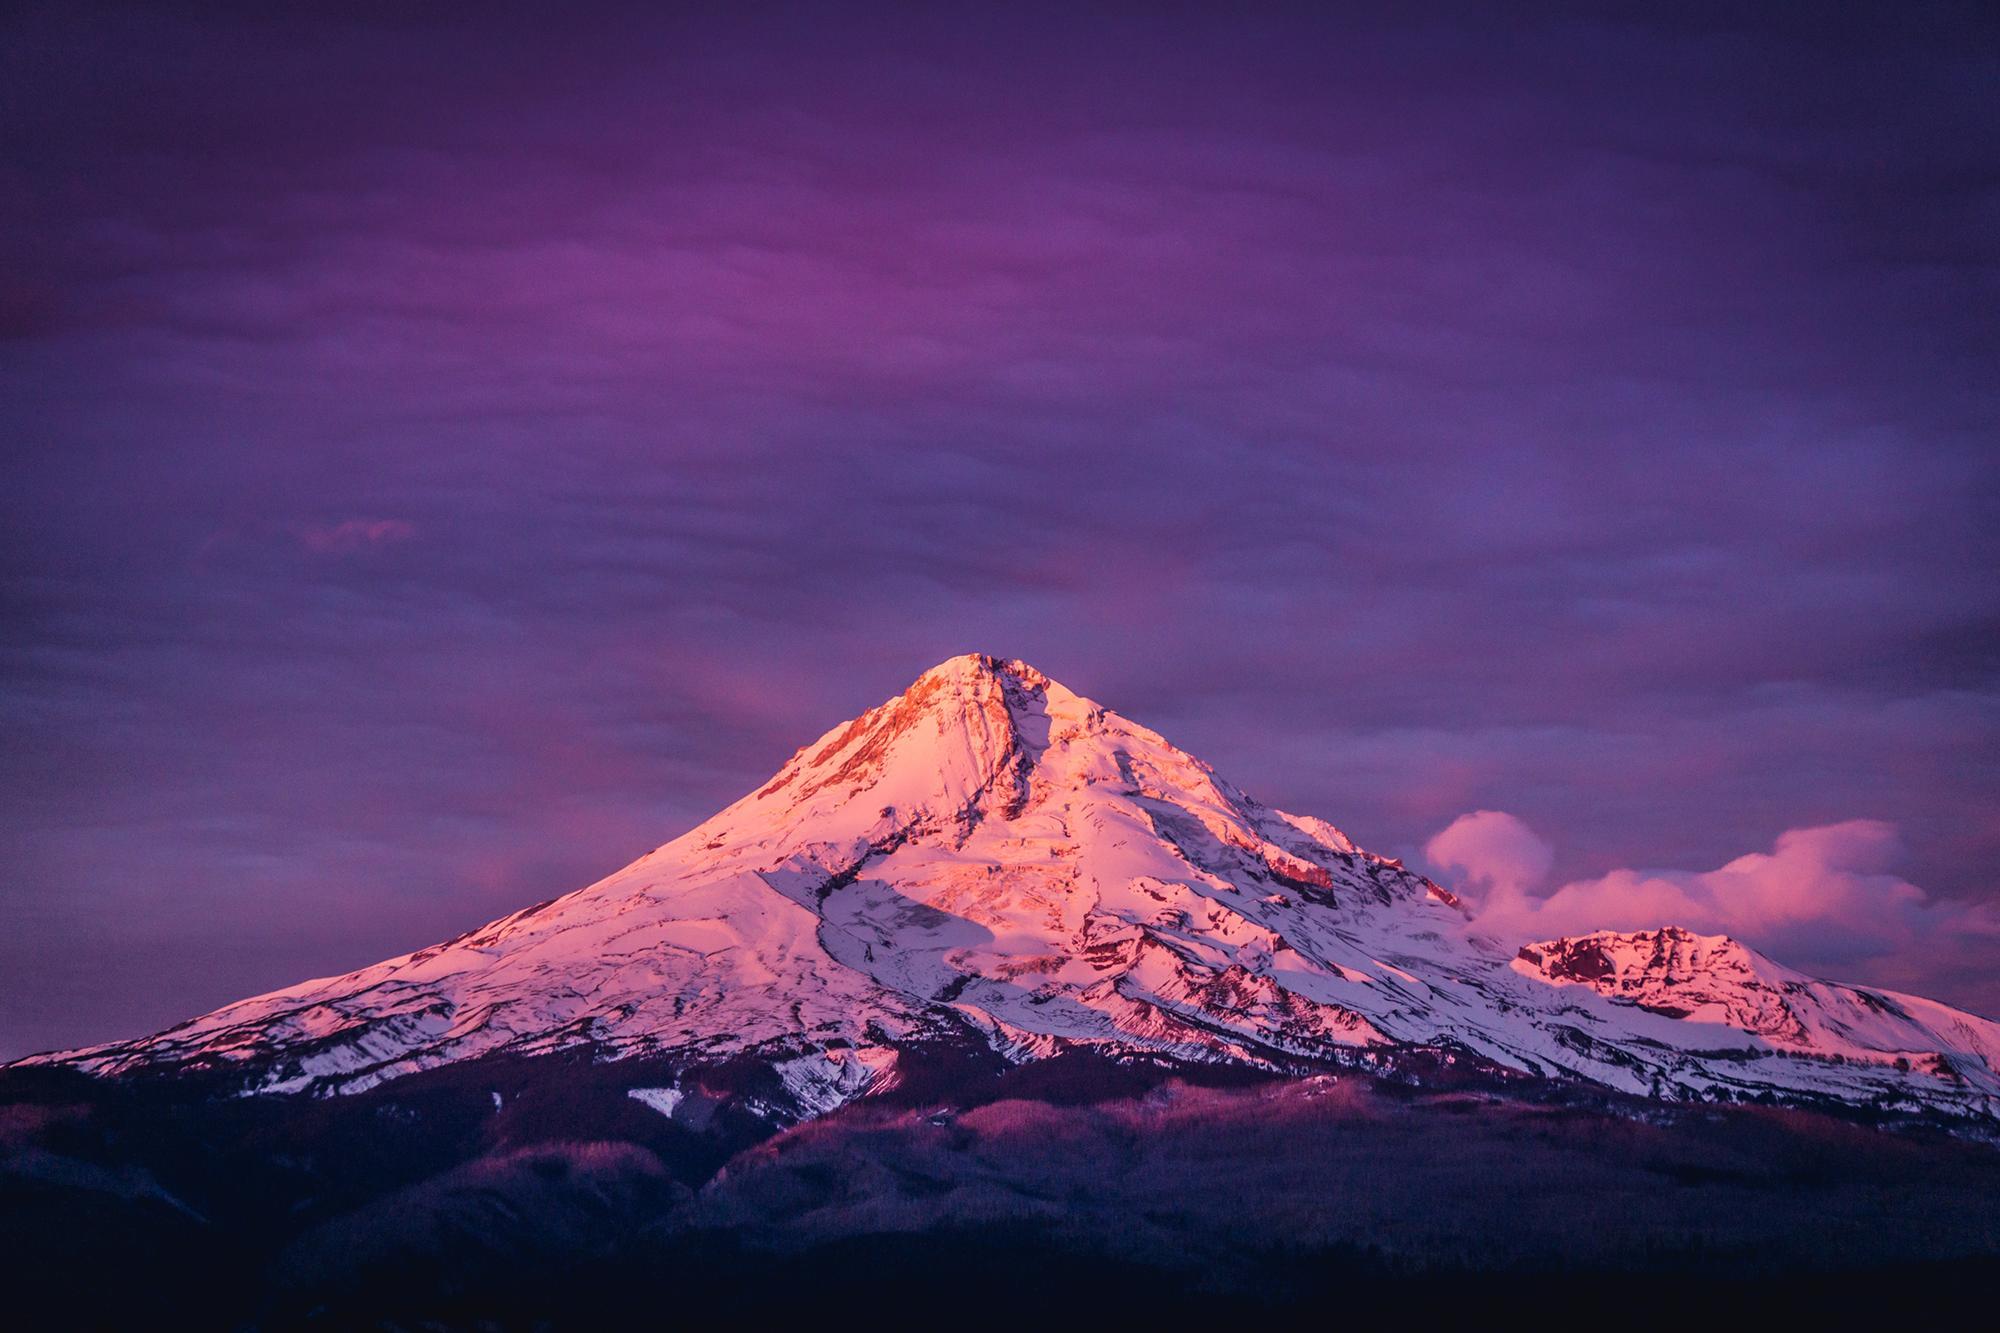 First light on Mount Hood